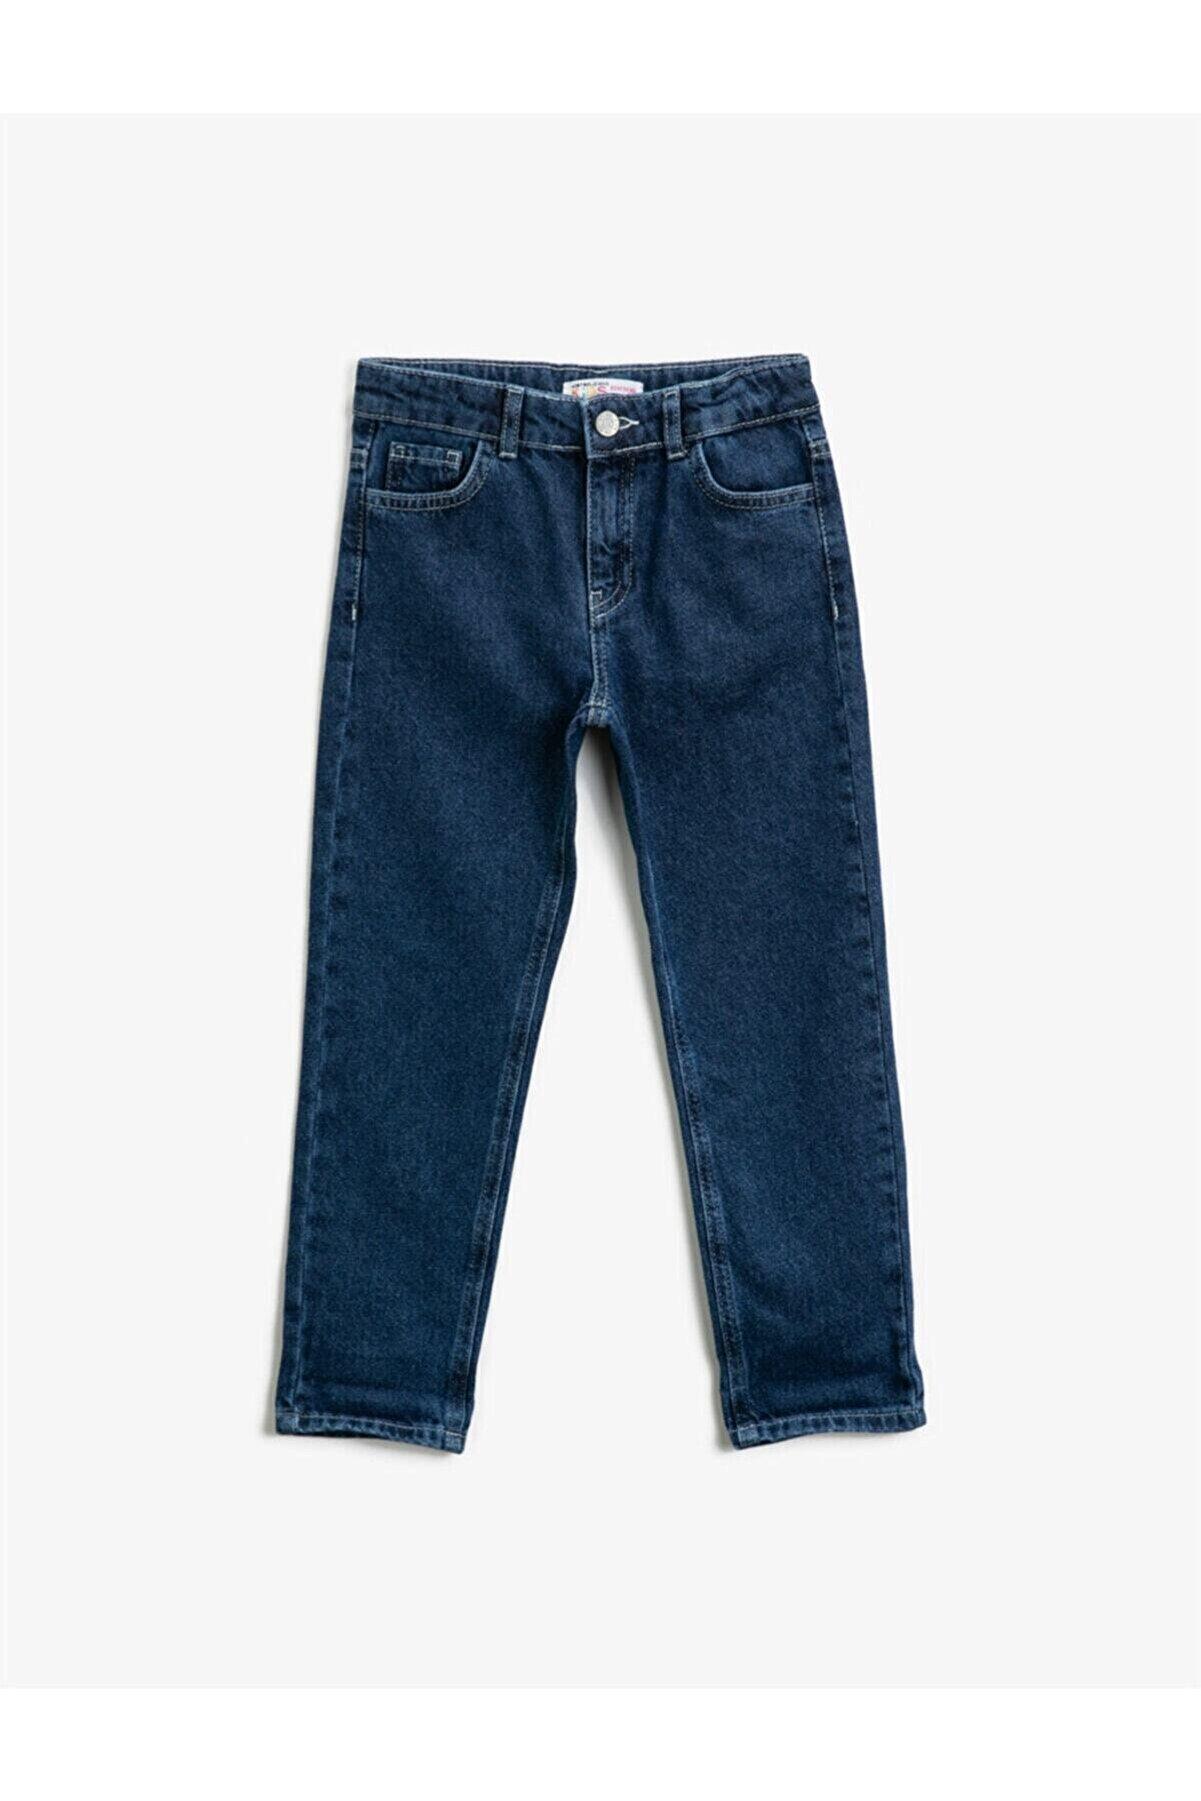 Koton Kız Çocuk Orta Indigo Jeans 1YKG47754OD